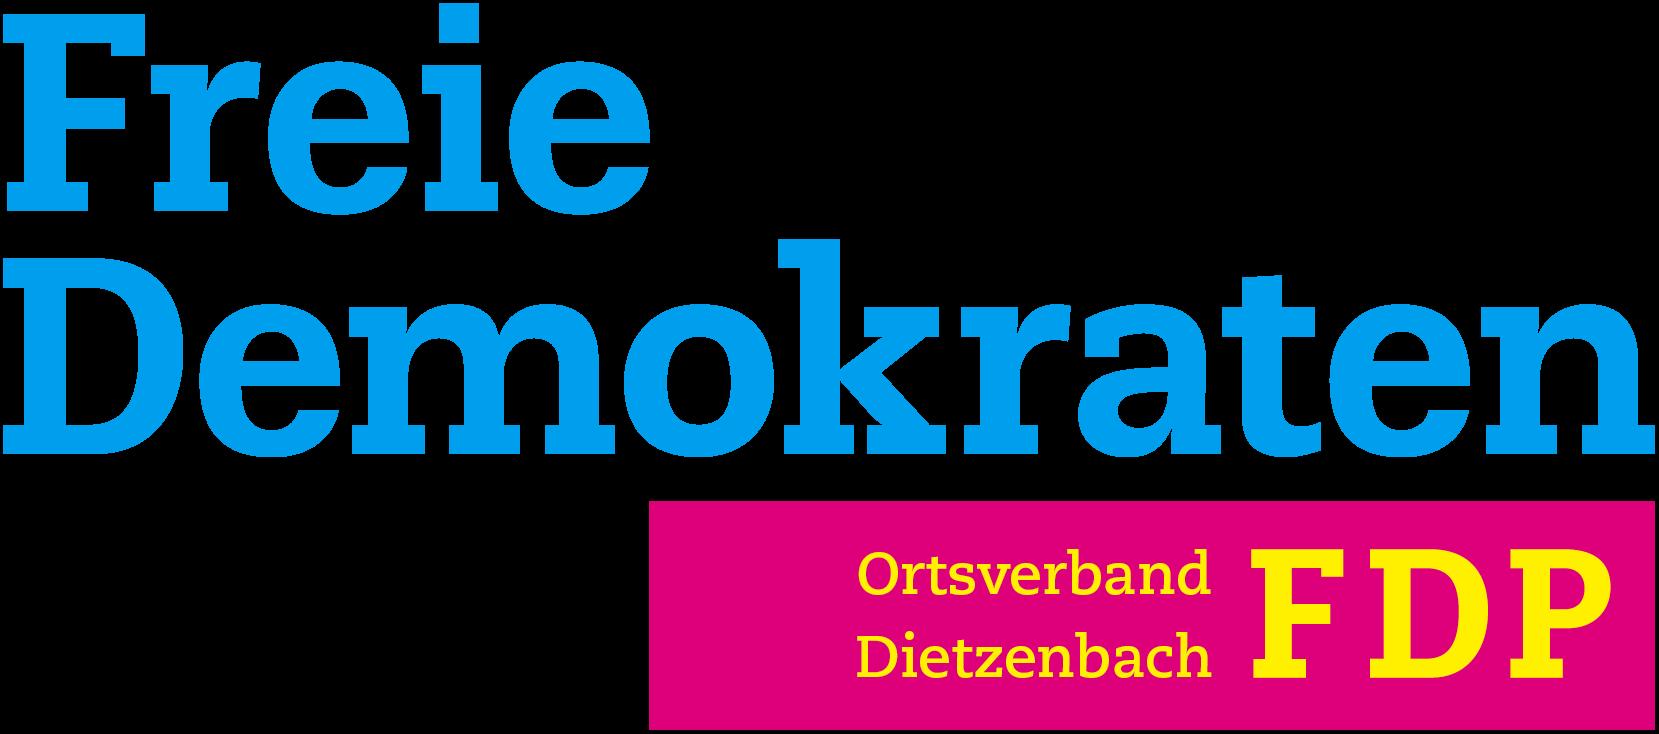 FDP Dietzenbach